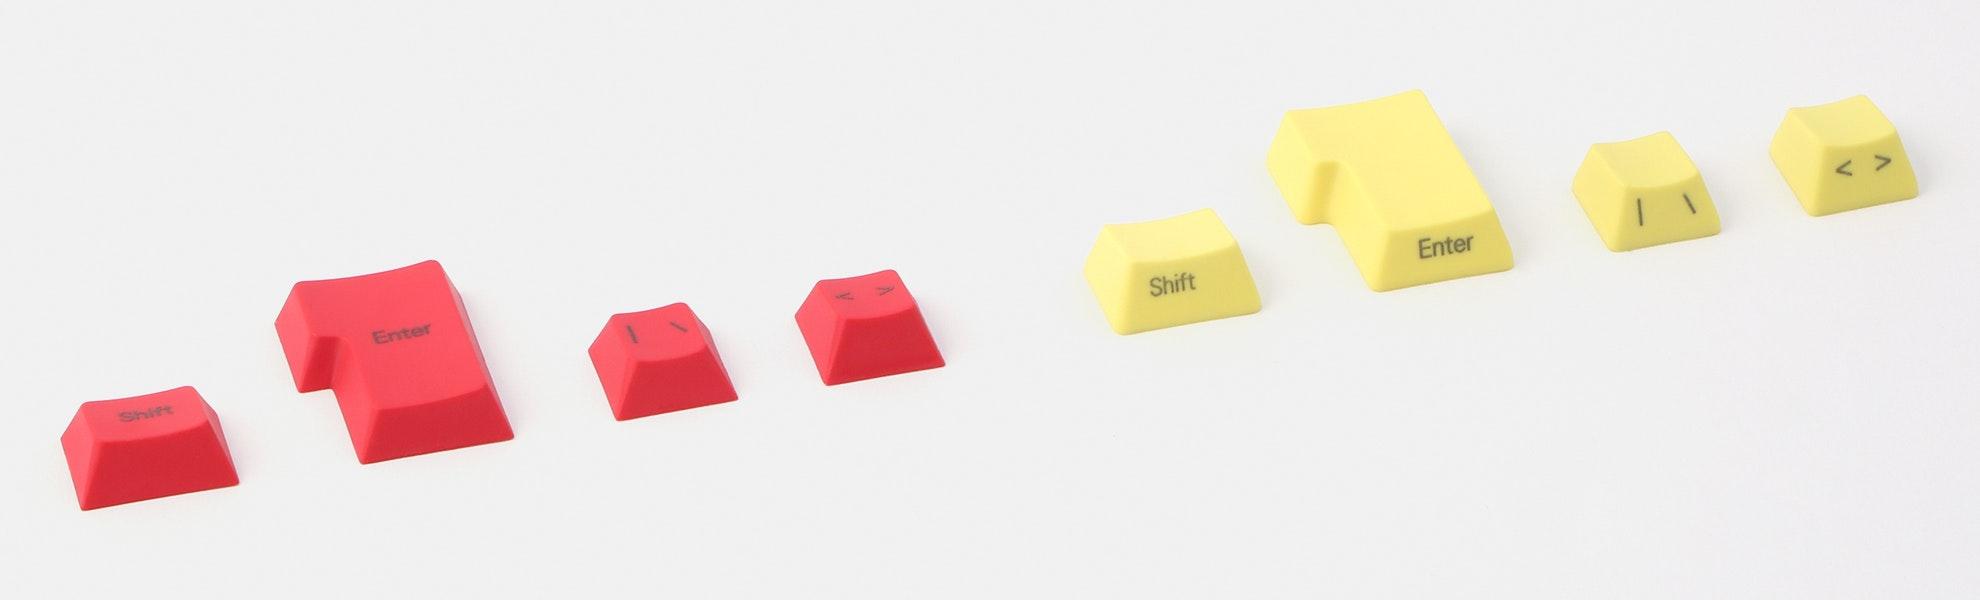 PBT ISO Keycaps Pack (4pcs)